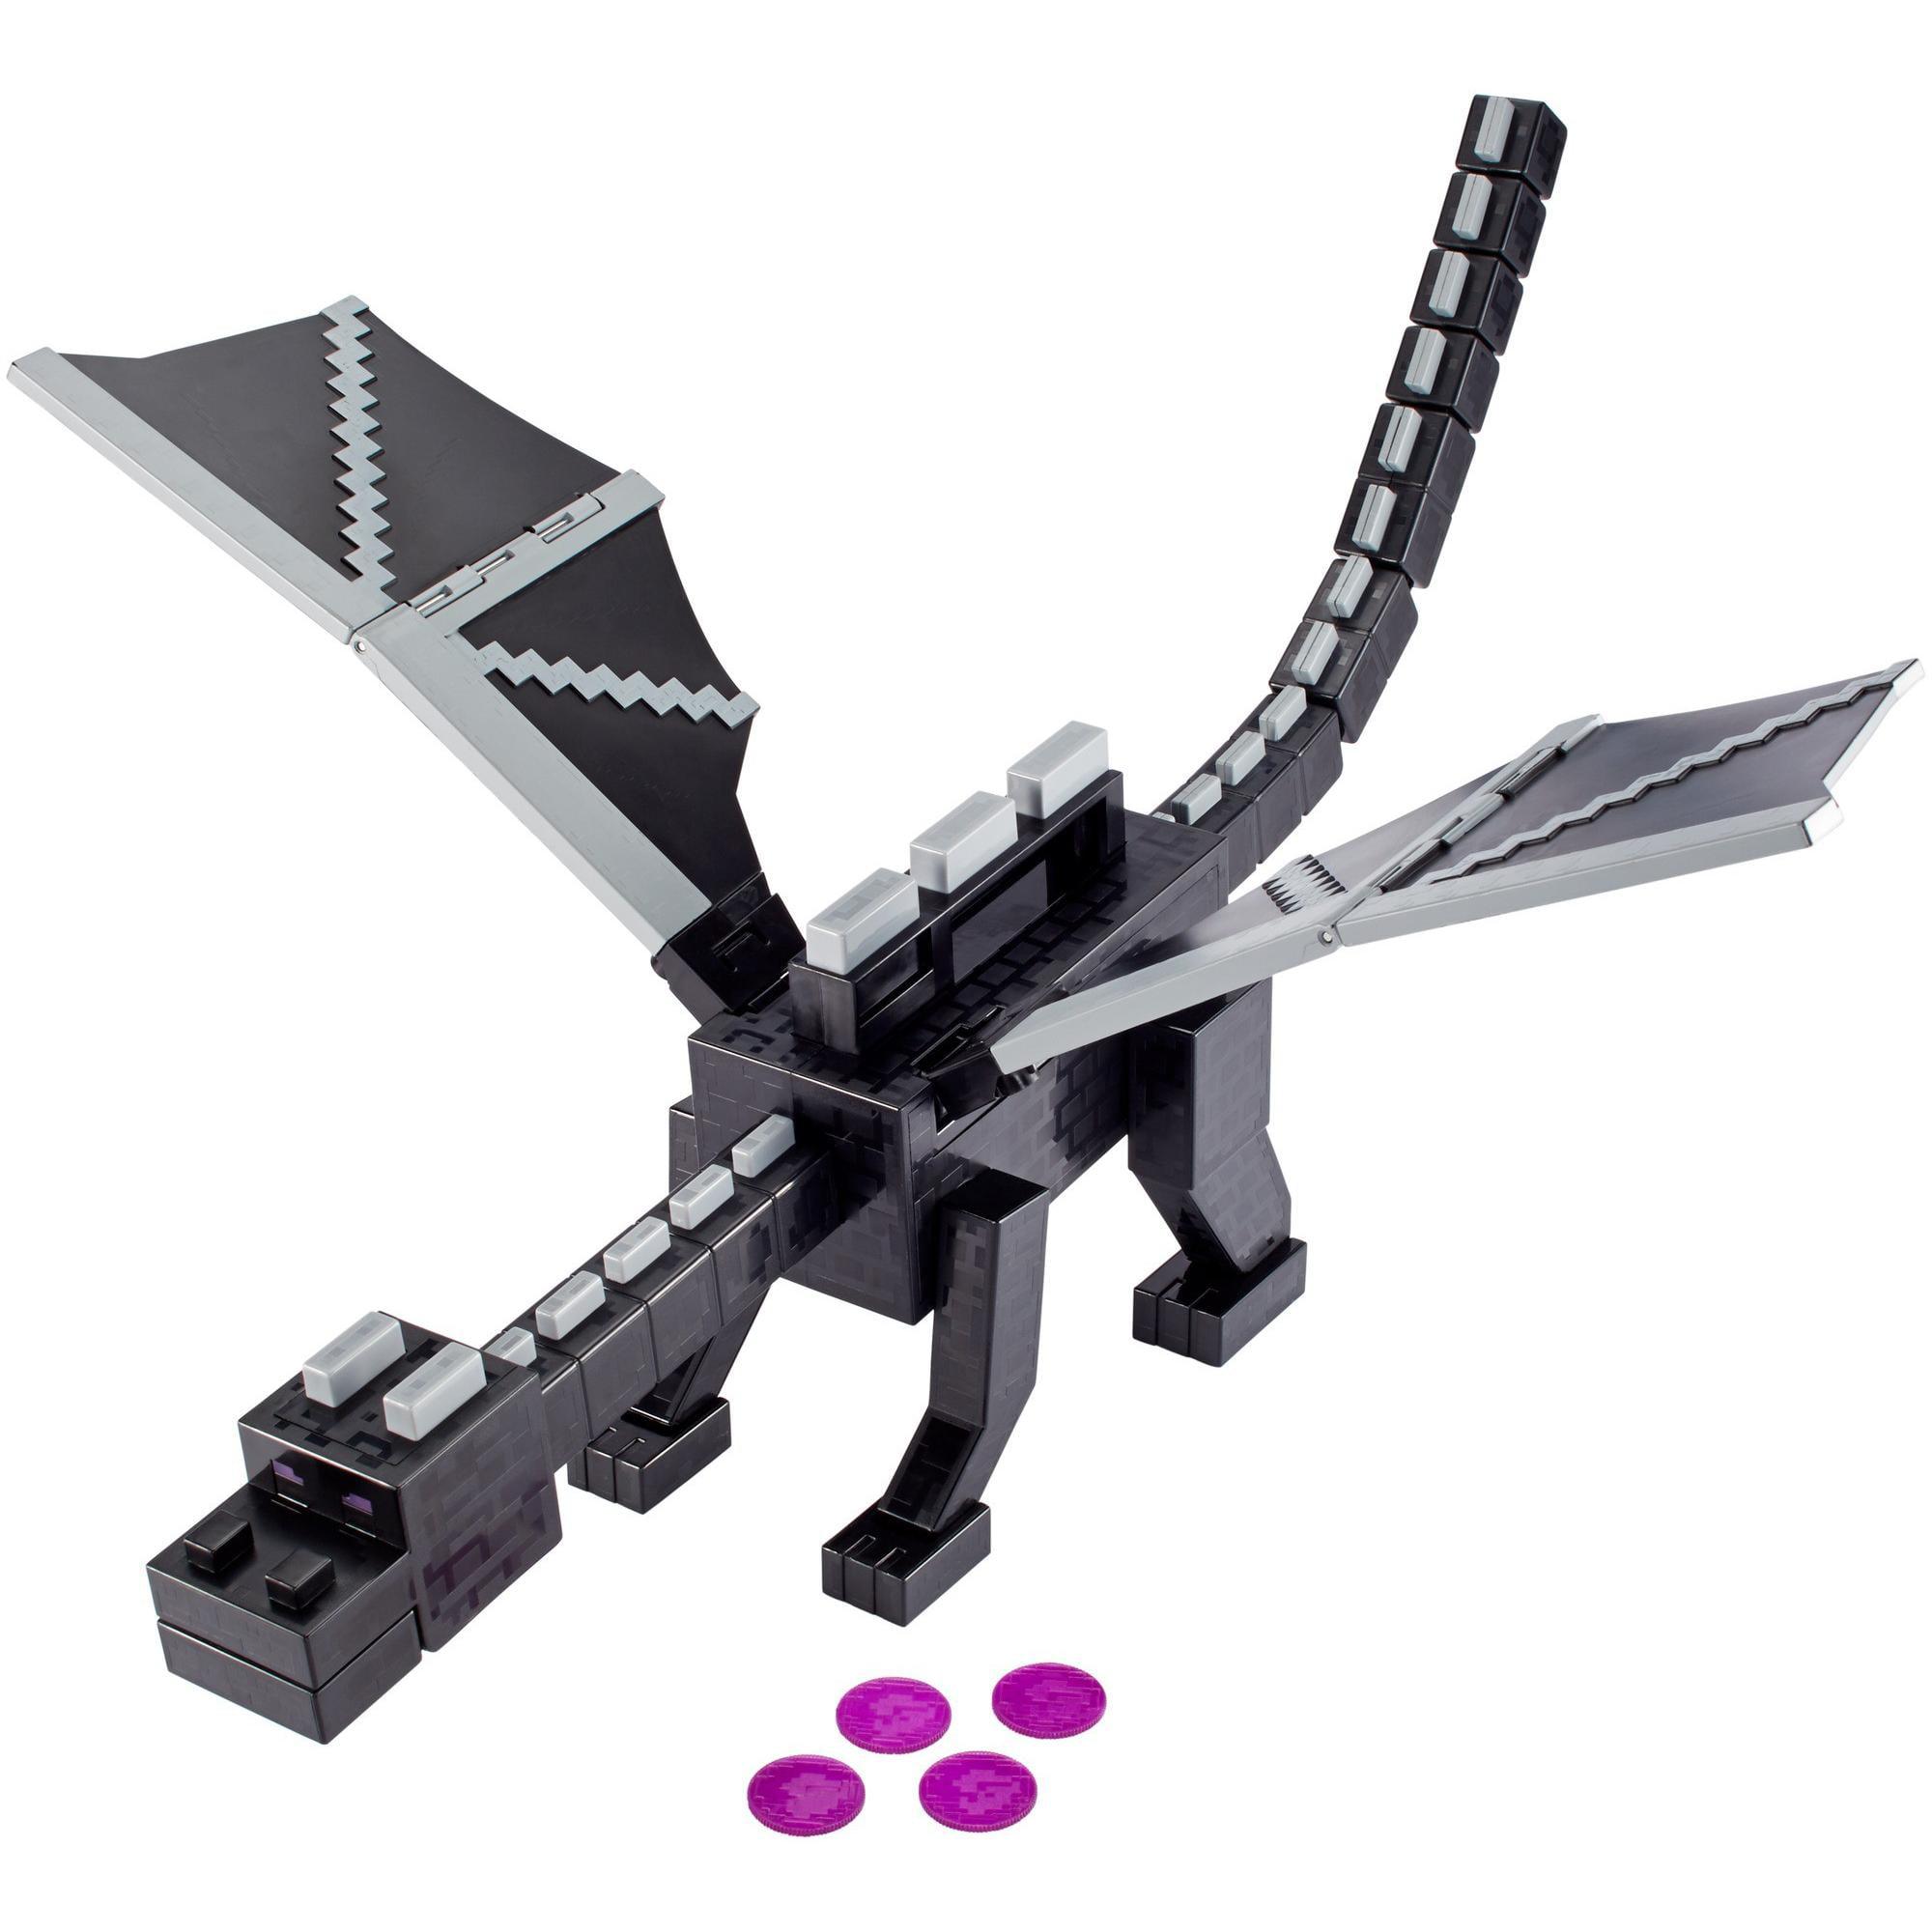 Minecraft Ender Dragon Action Figure by Mattel